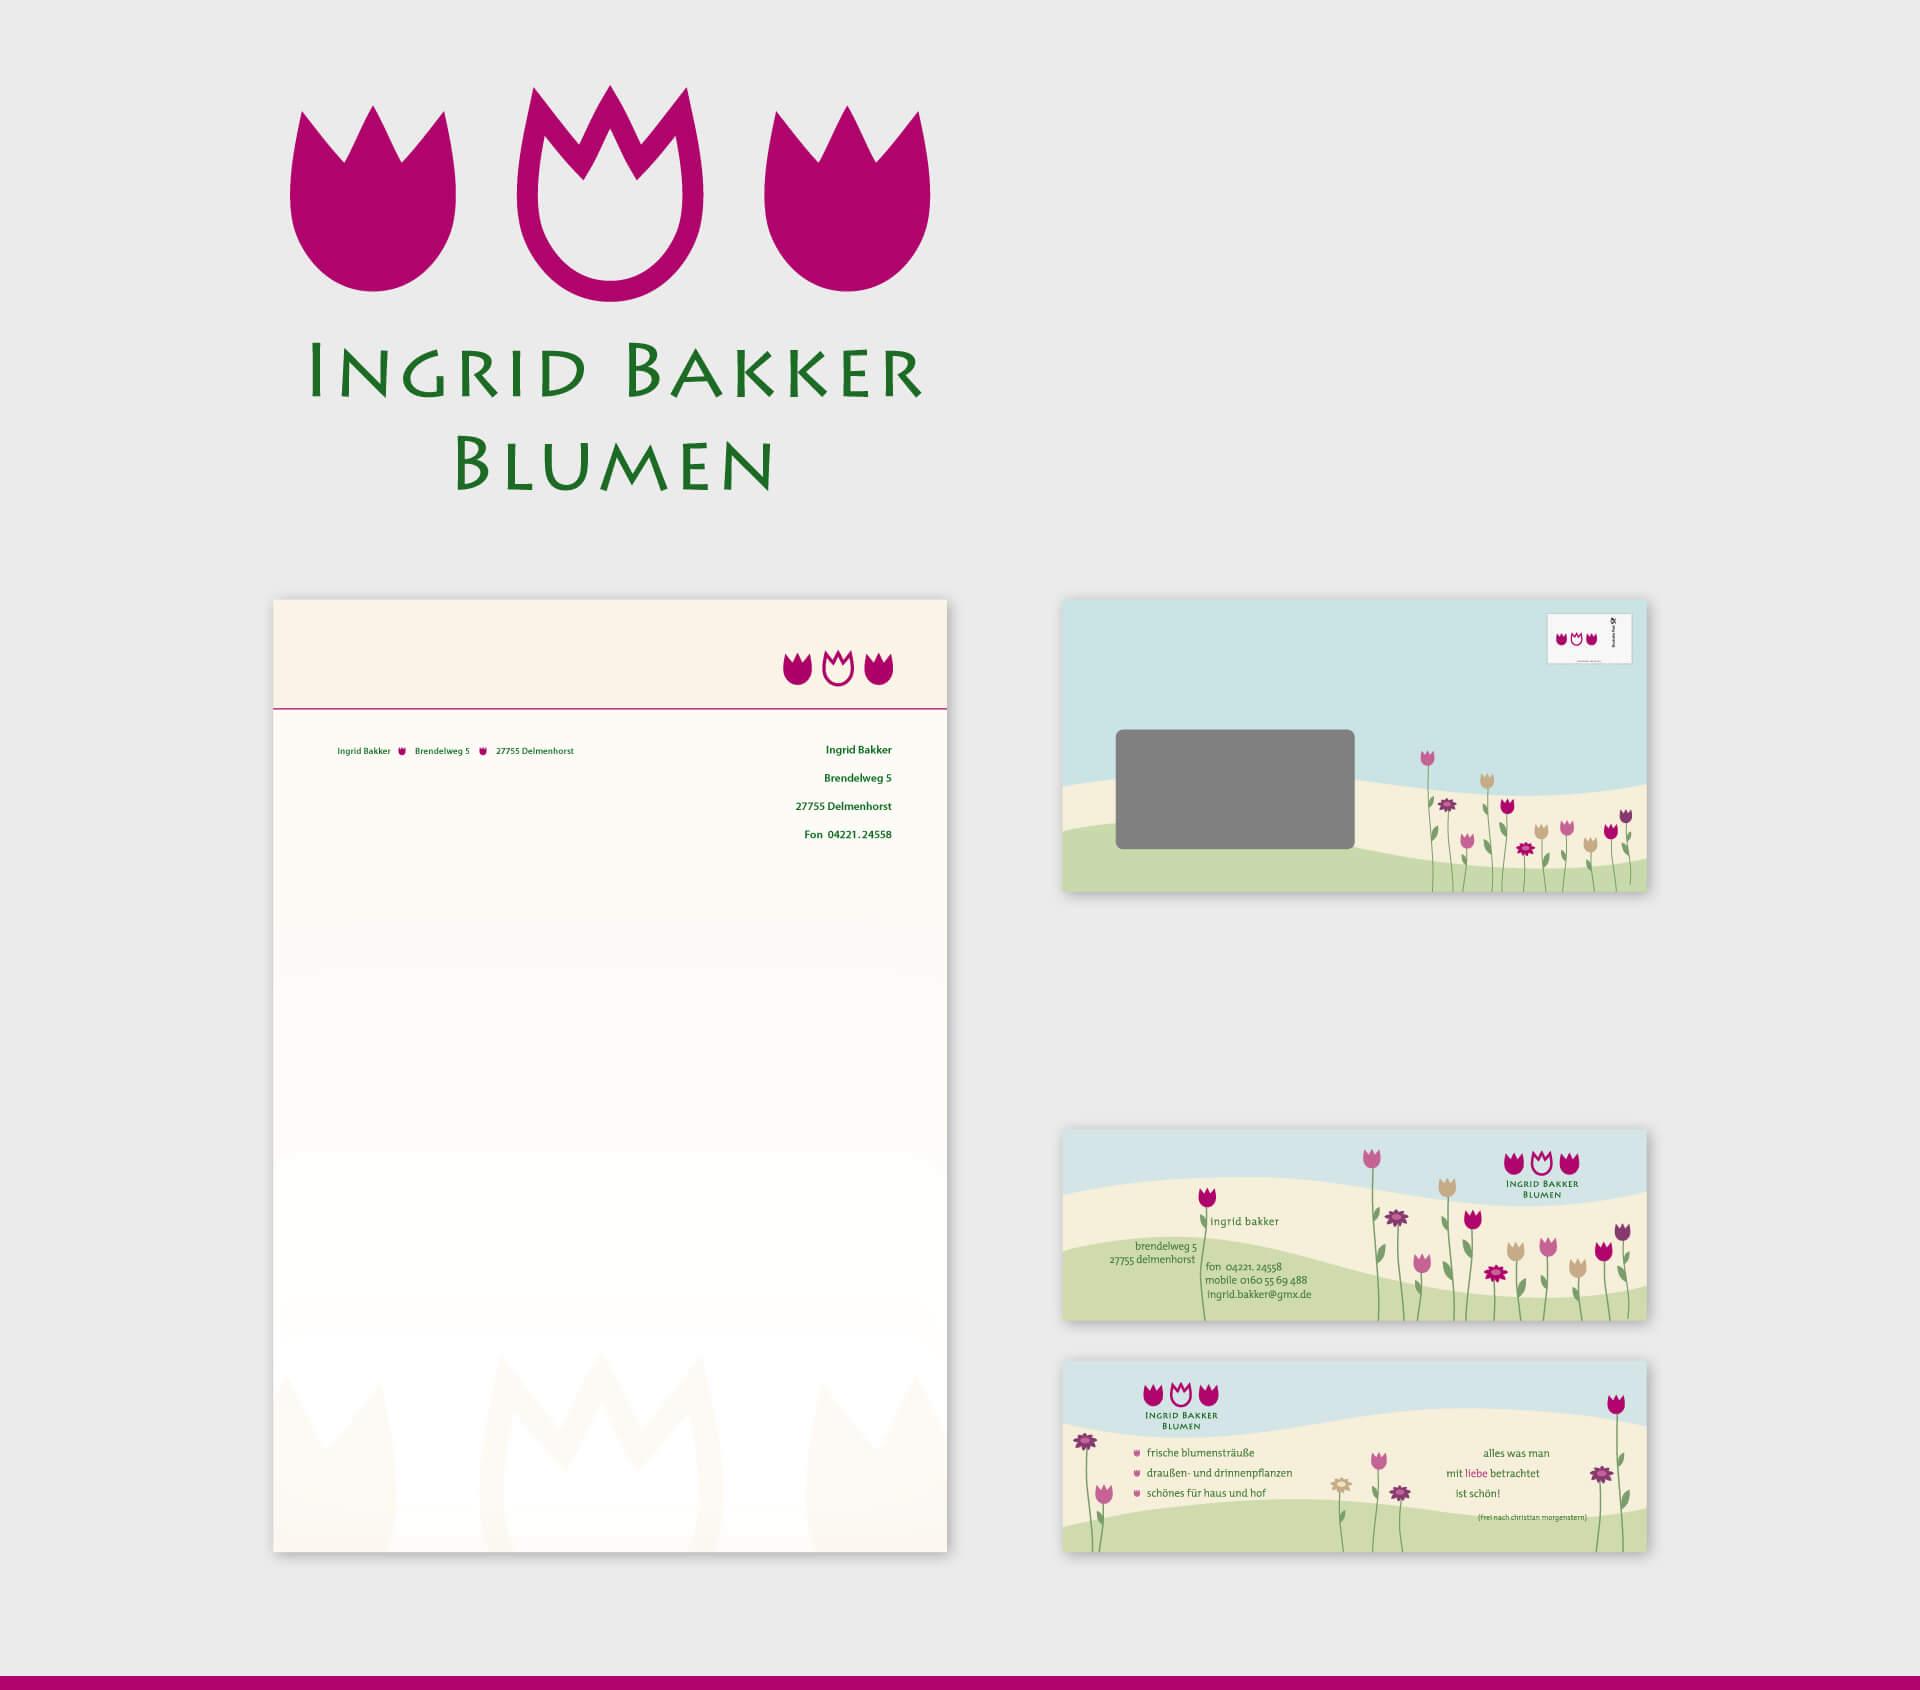 Ingrid Bakker Blumen Briefpapier Briefumschlag Visitenkarte